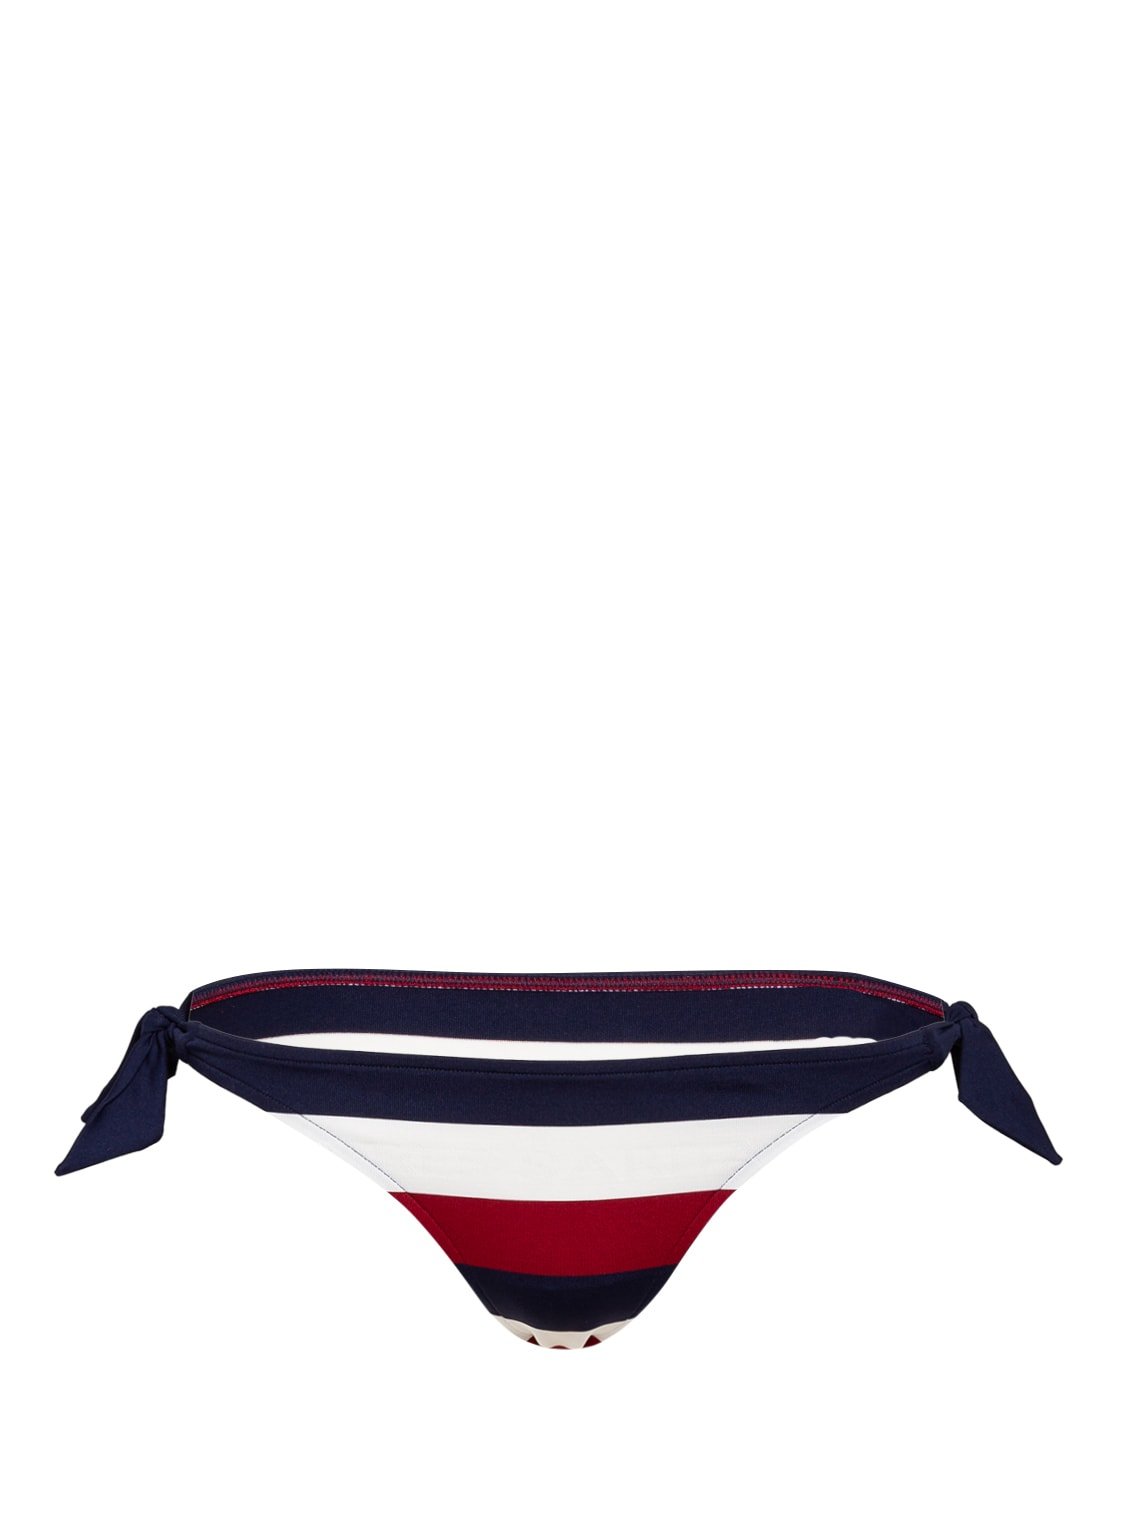 Image of Andres Sarda Bikini-Hose Megan blau